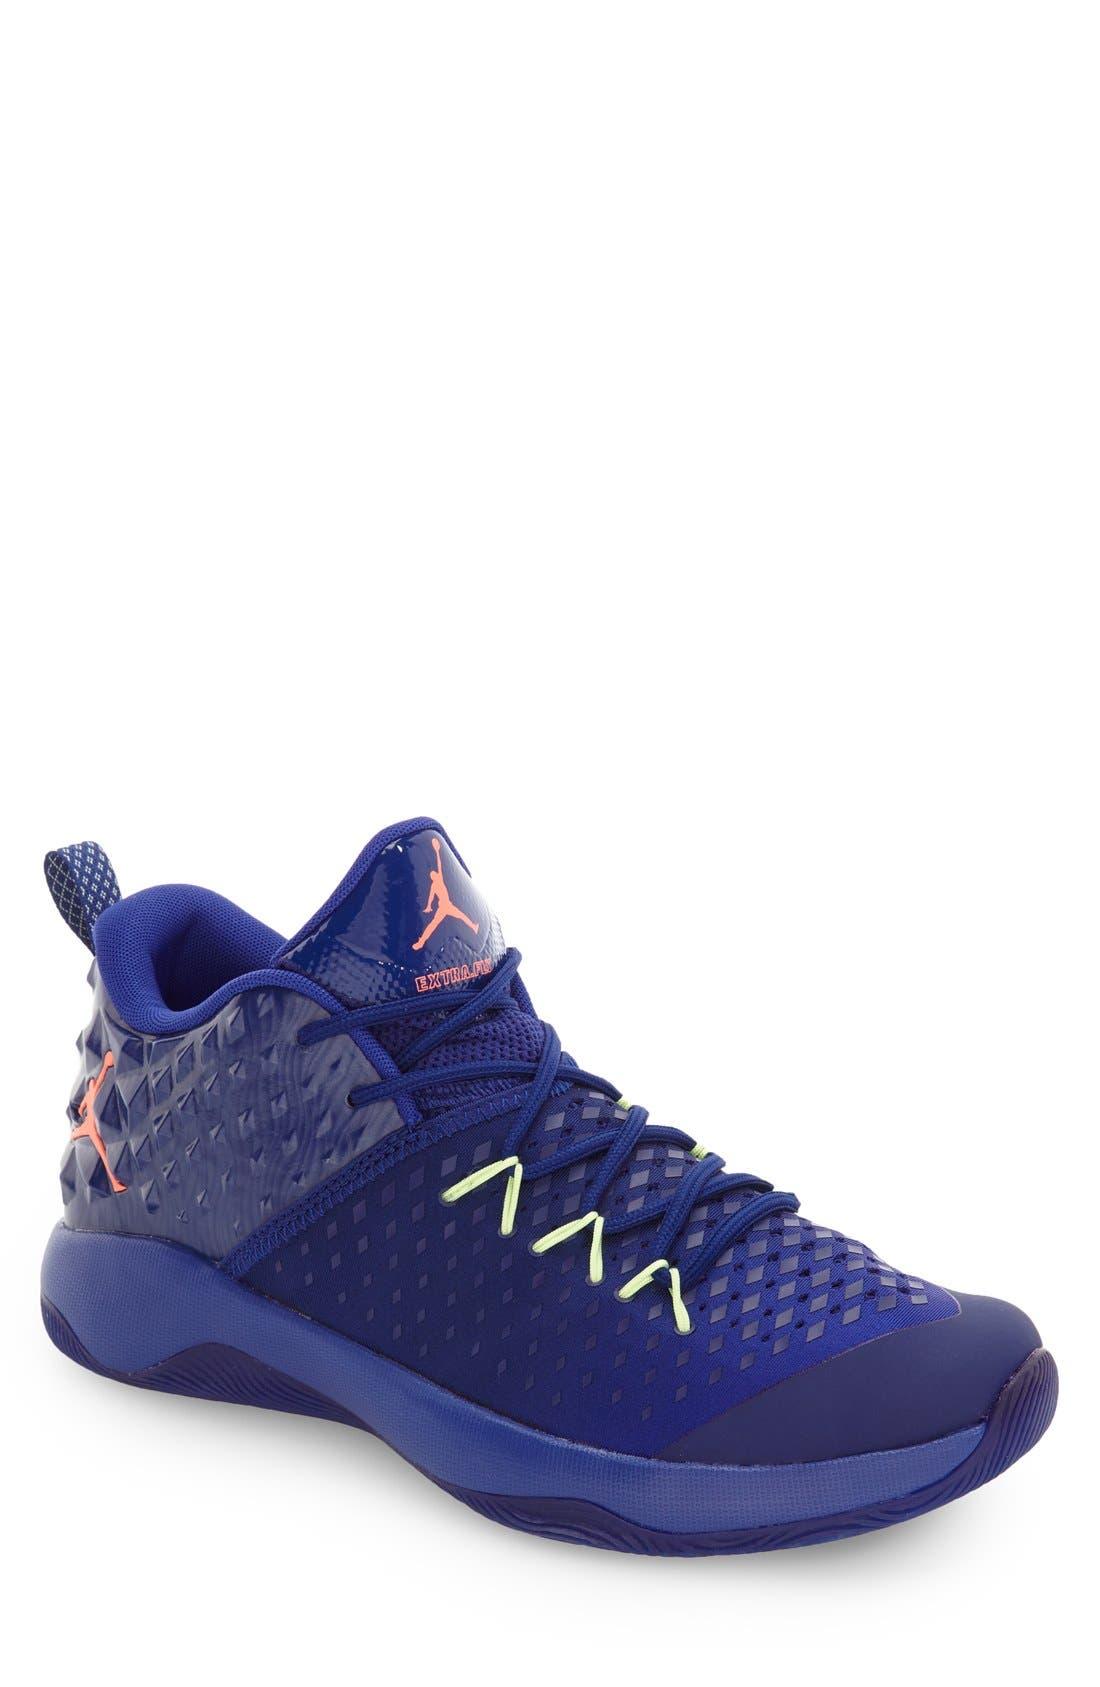 Alternate Image 1 Selected - Nike Jordan Extra Fly Sneaker (Men)